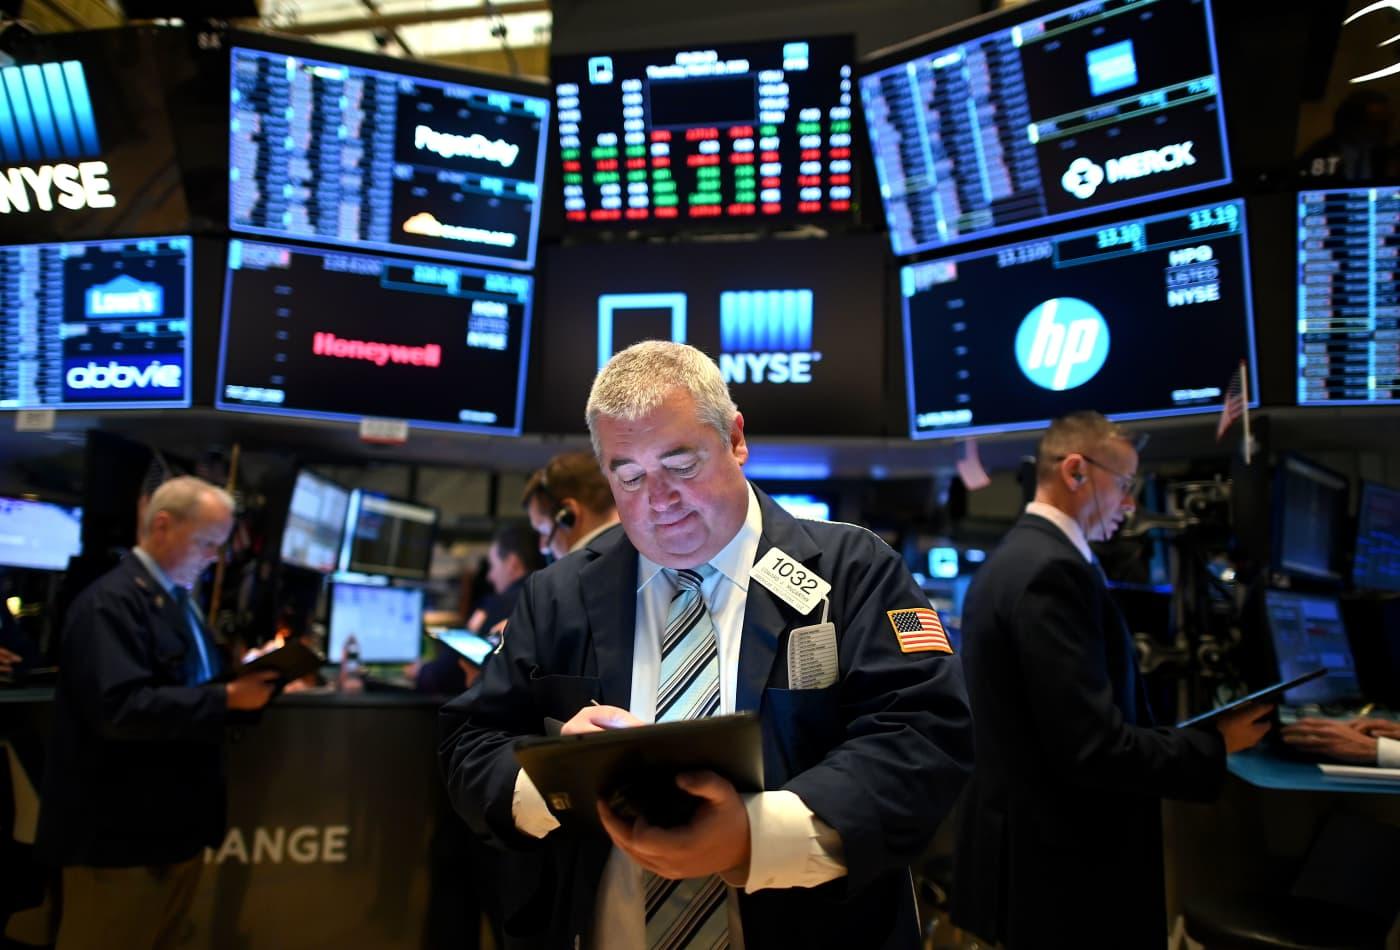 Jim Cramer's week ahead: 'Good riddance' to September